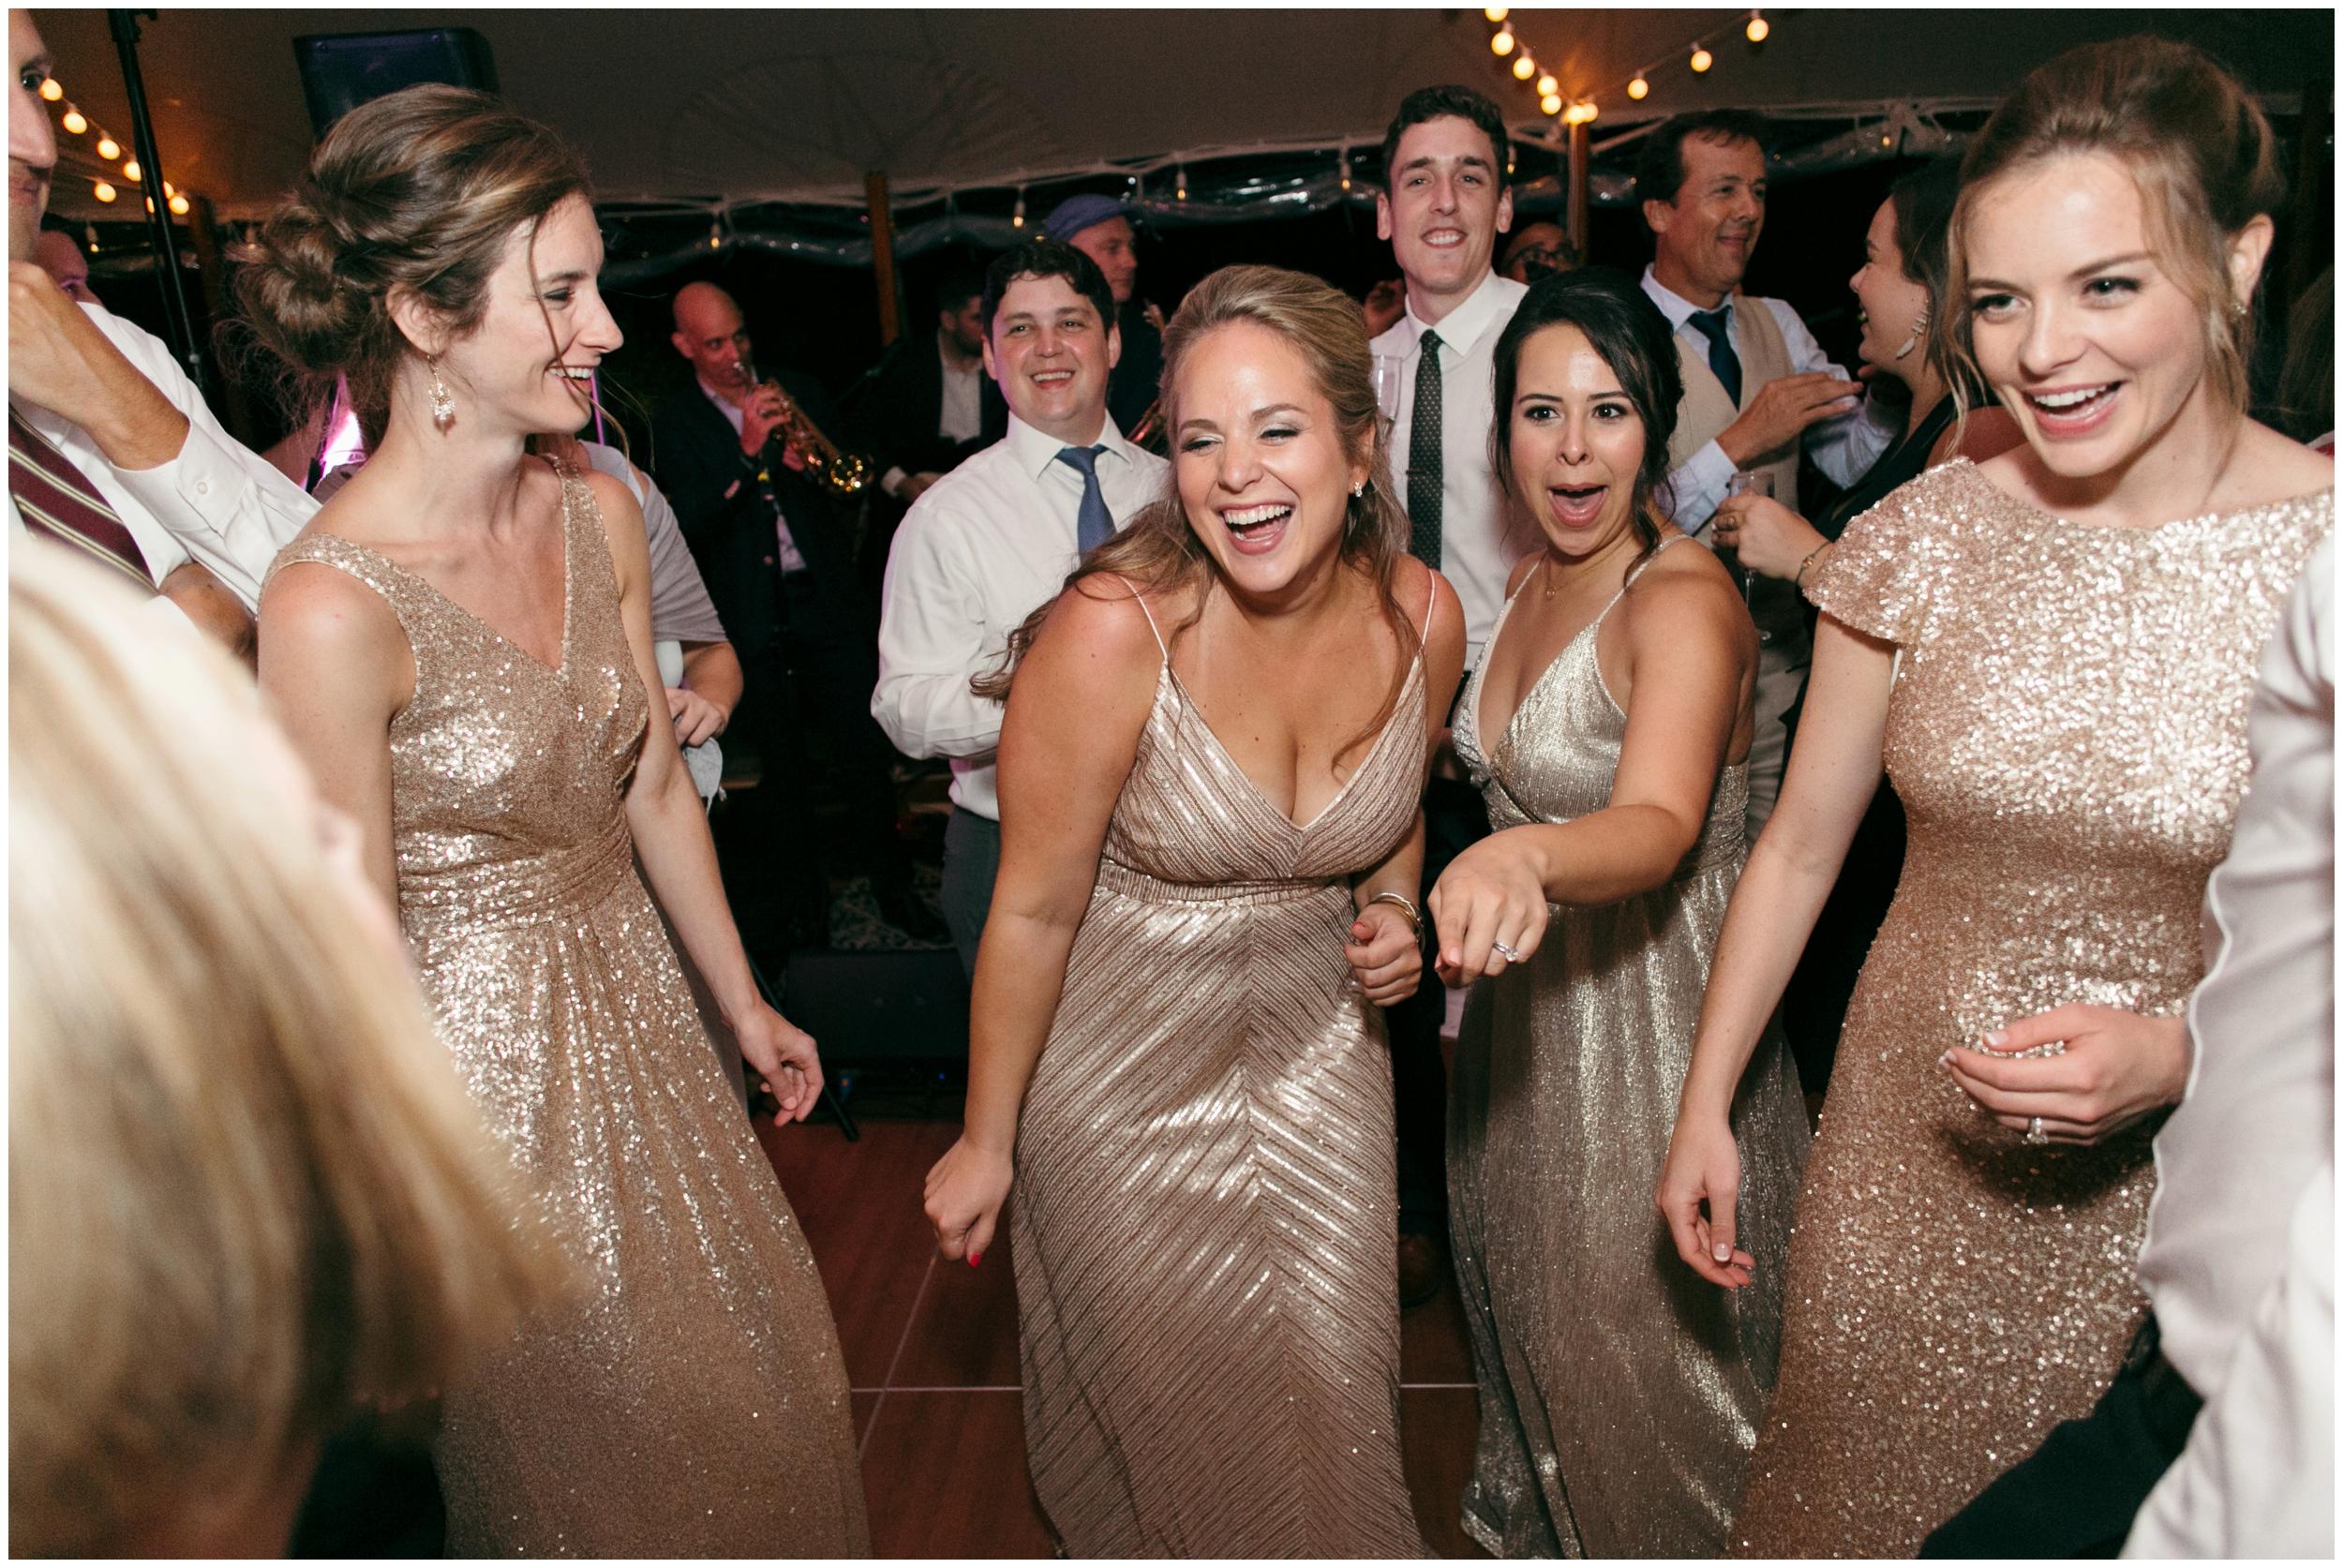 Willowdale-Estate-Wedding-Bailey-Q-Photo-Boston-Wedding-Photographer-106.JPG